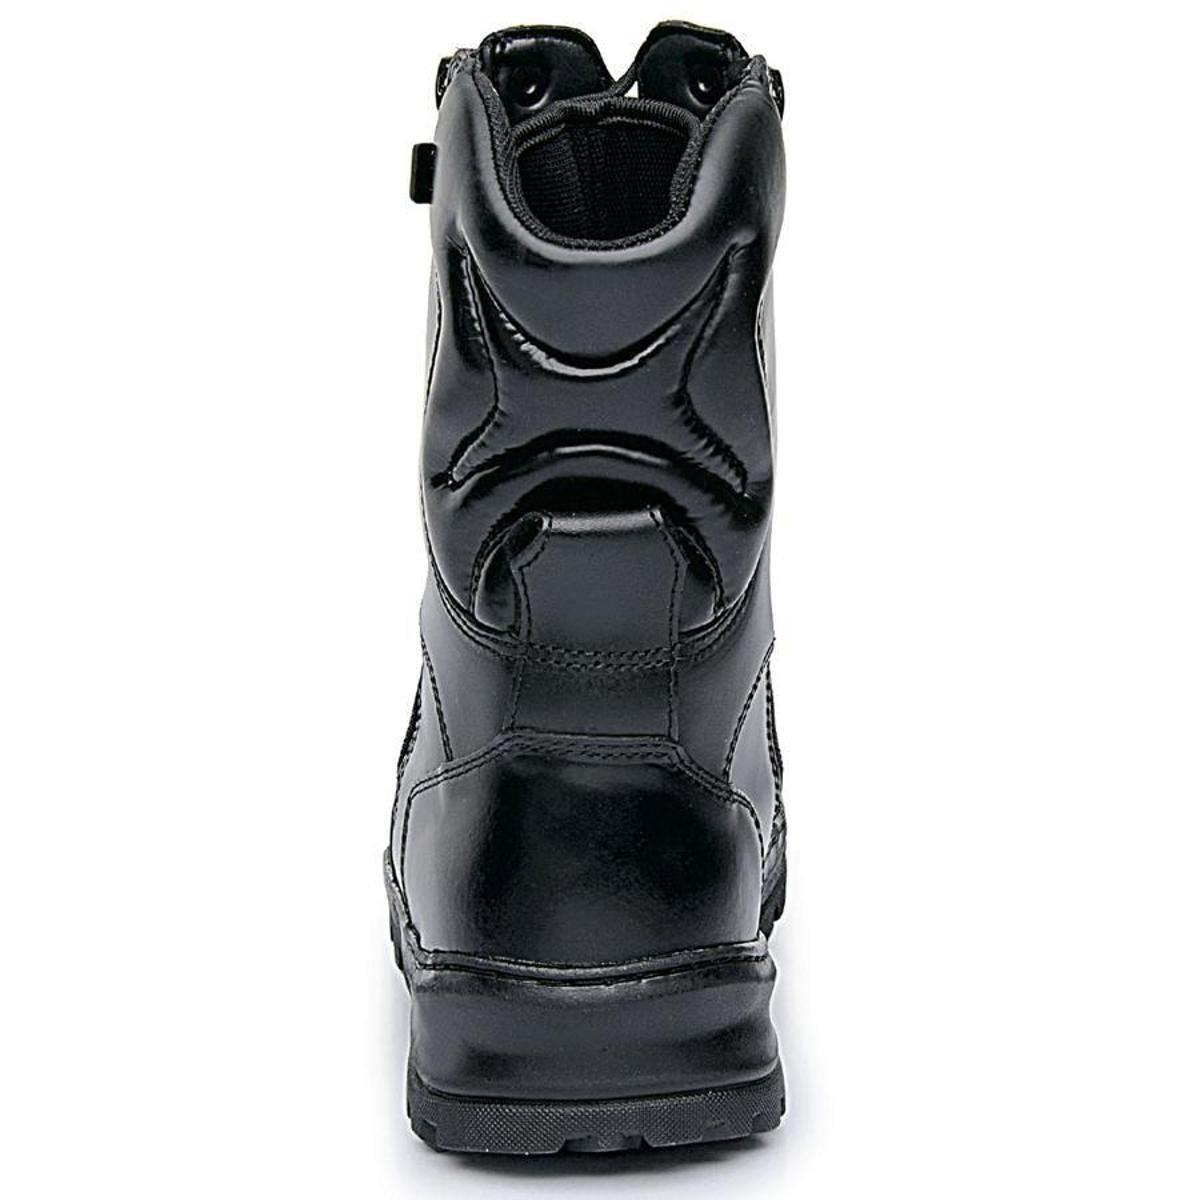 Militar Masculina Preto Tática Bota Bota Sniper Tática Sniper Militar Rossi Masculina Bota Preto Rossi PwxqA6Z8p